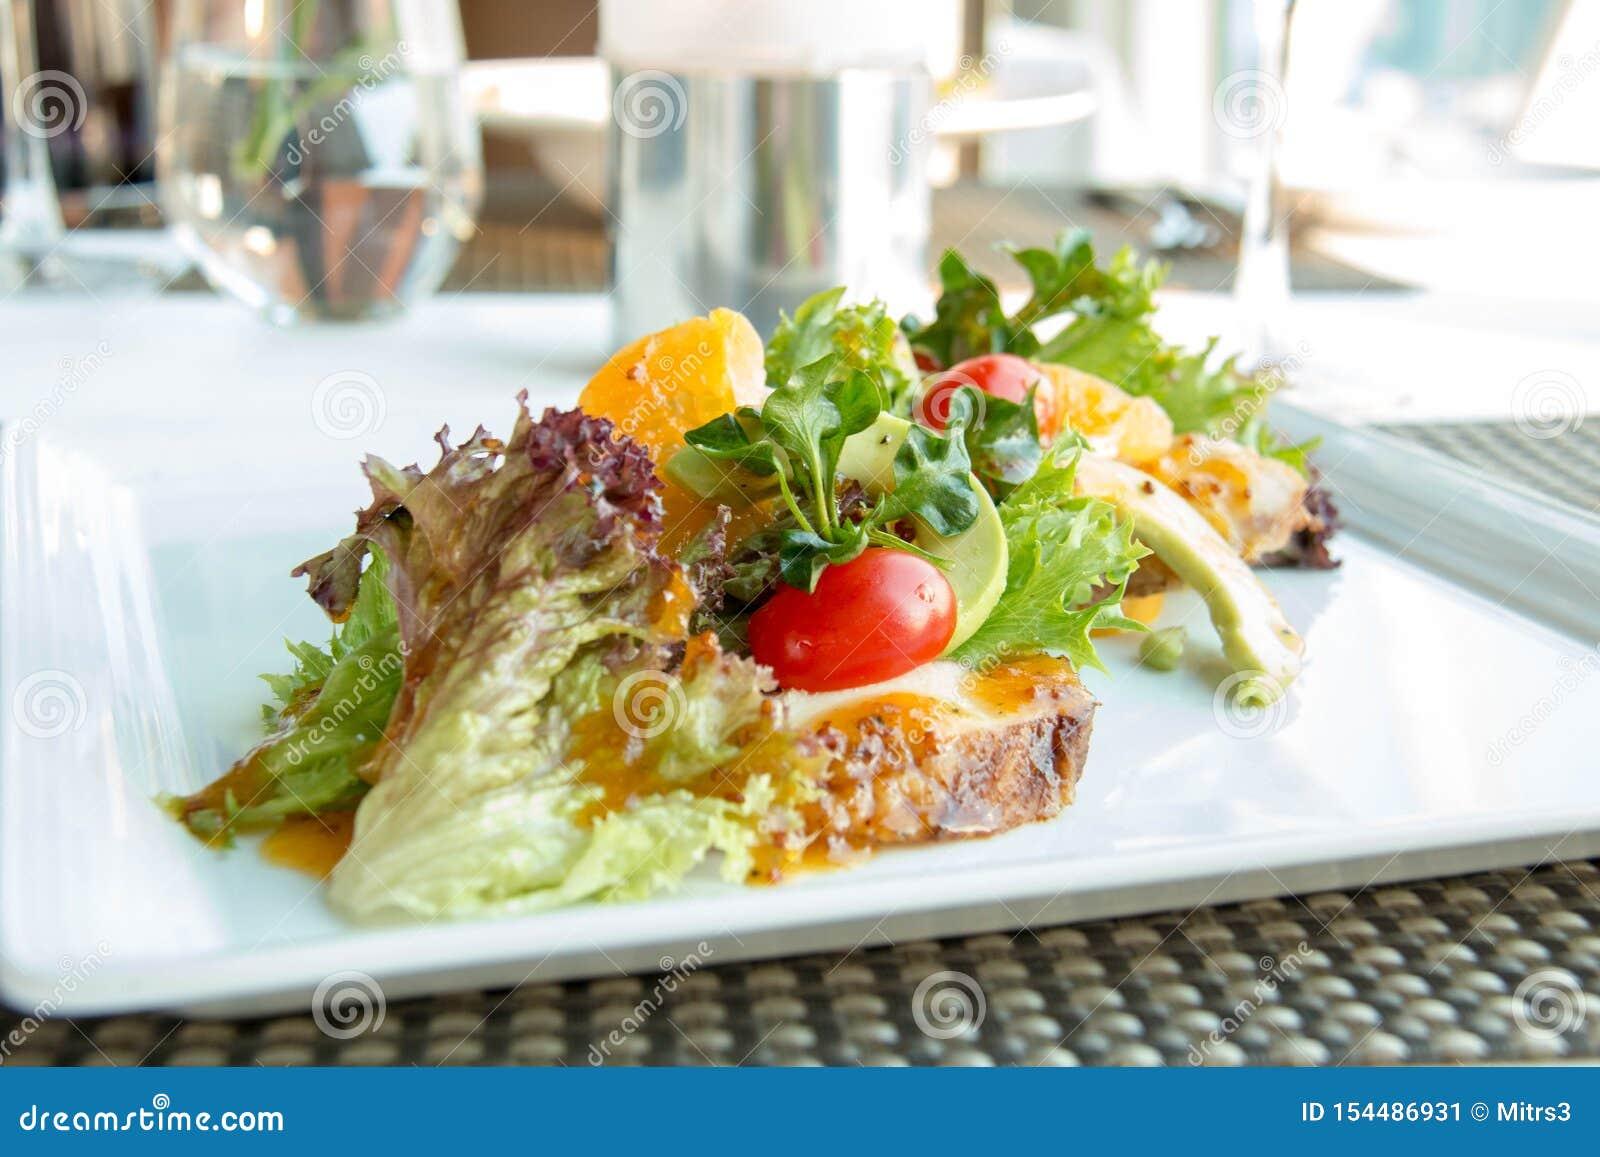 Salada dos legumes misturados na placa branca